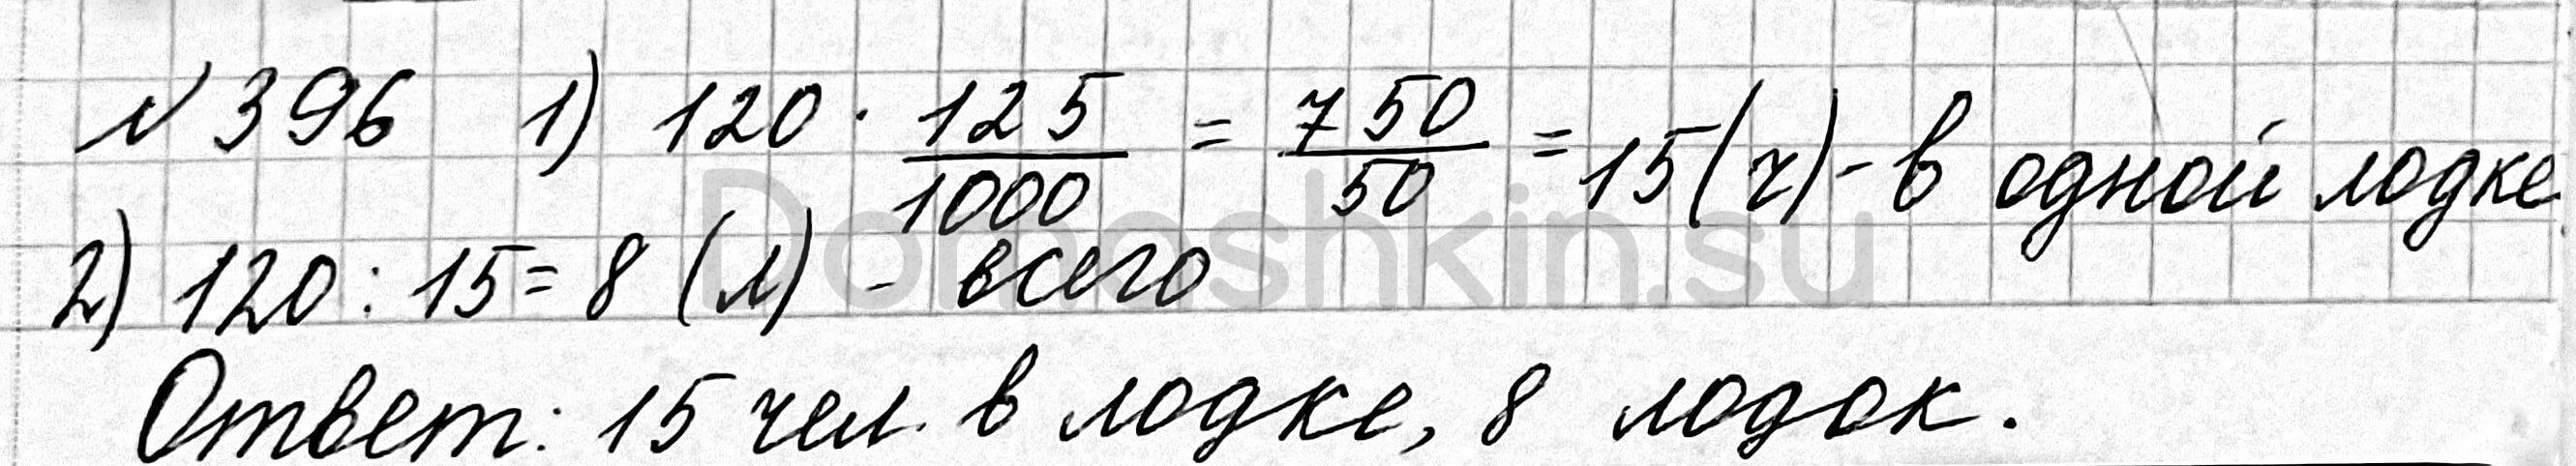 Математика 6 класс учебник Мерзляк номер 396 решение